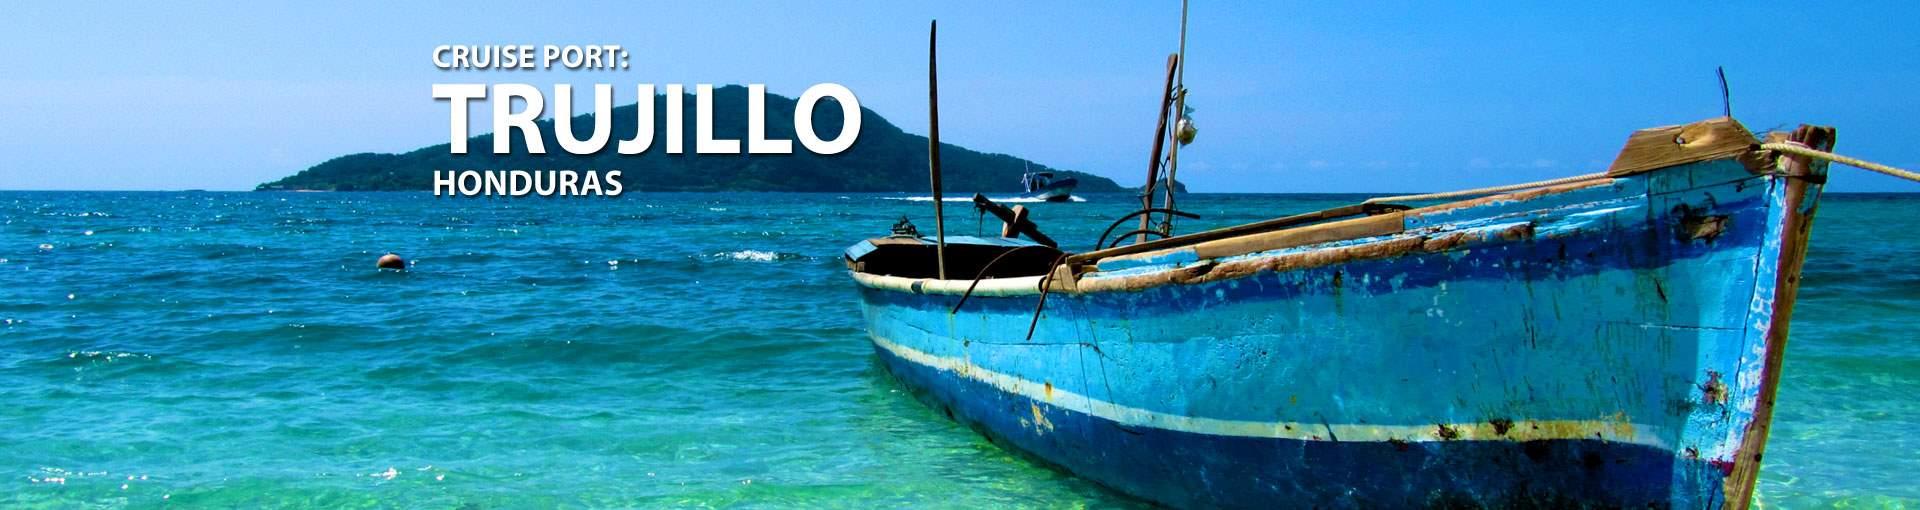 Cruises to Trujillo, Honduras